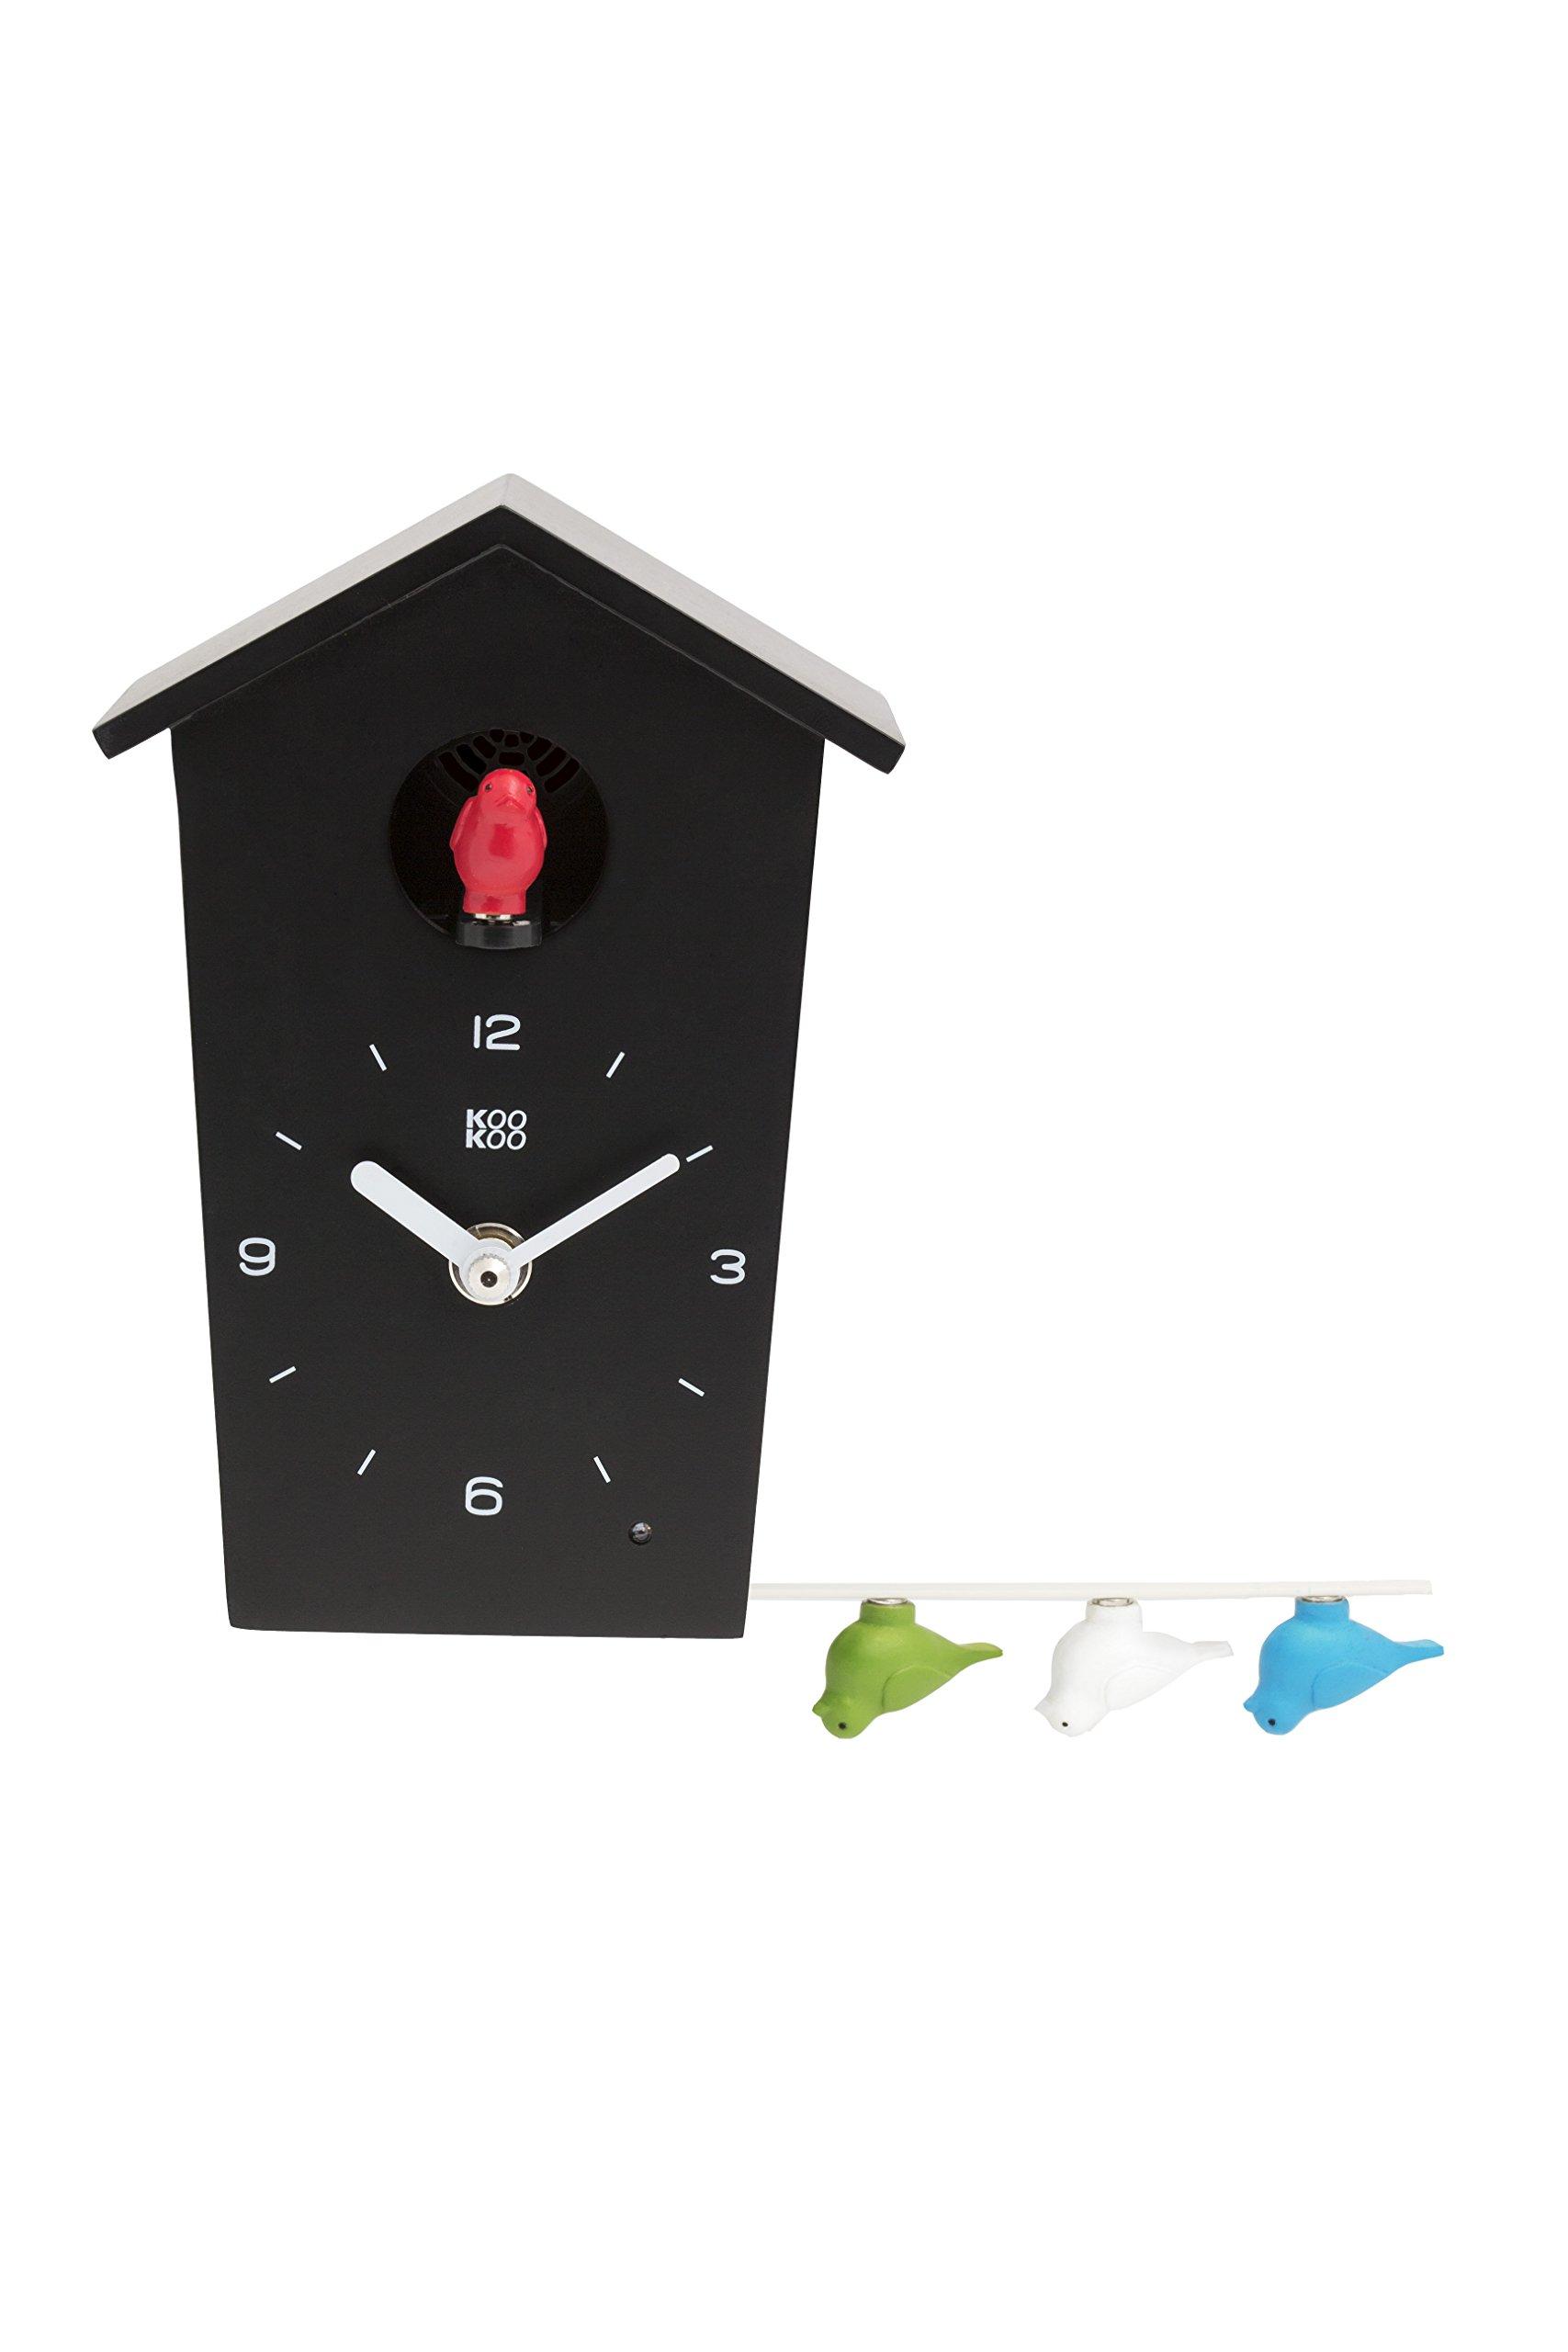 KOOKOO Birdhouse Mini Black Wall Clock 12 Natural Bird Voices Field Recordings Cuckoo Small Cuckoo Clock Modern Design Songbird Clock